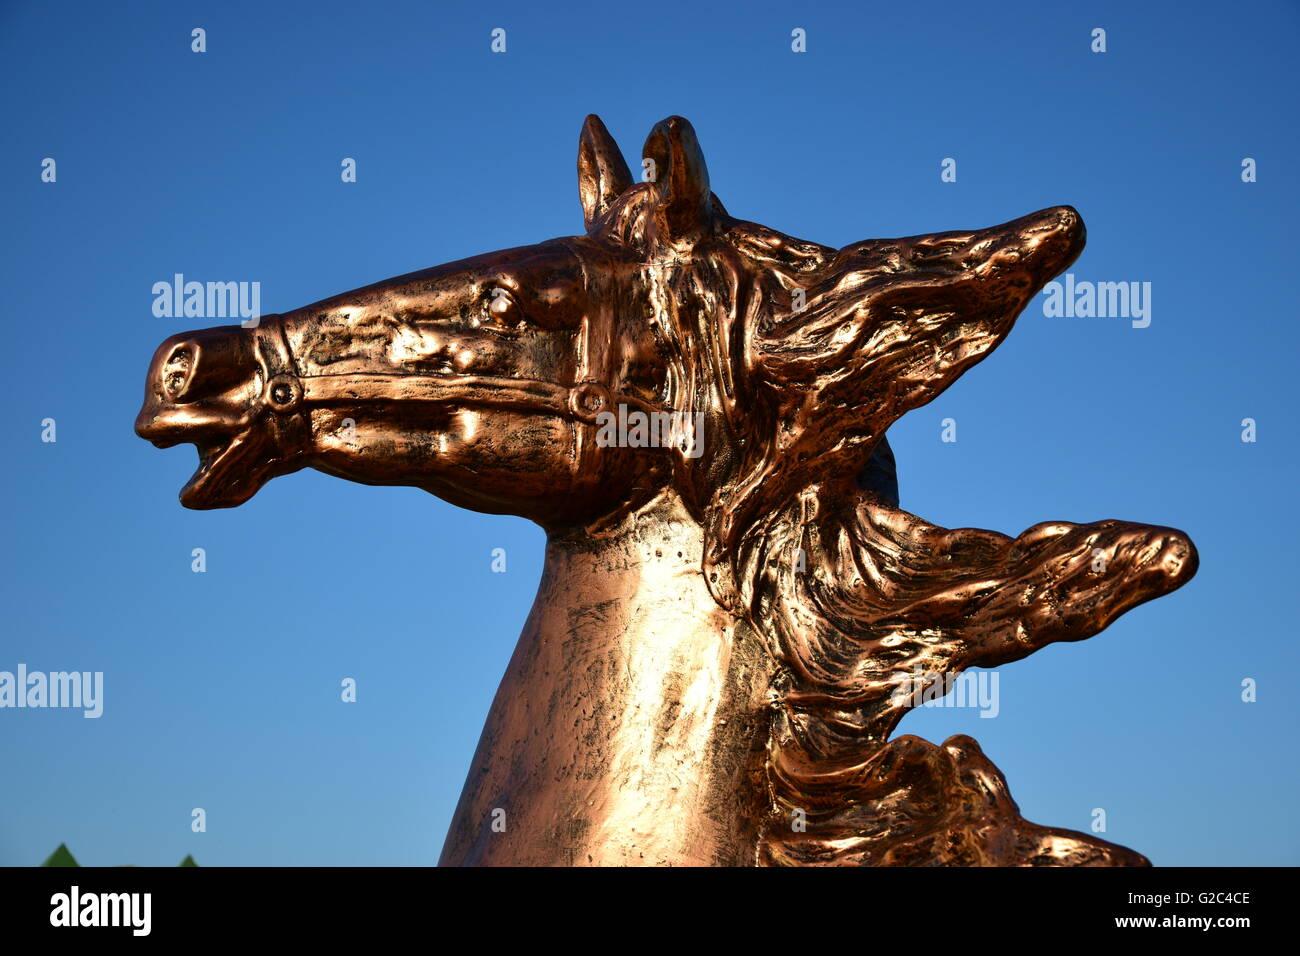 Bronze statue of horse in Astana, capital of Kazakhstan - Stock Image